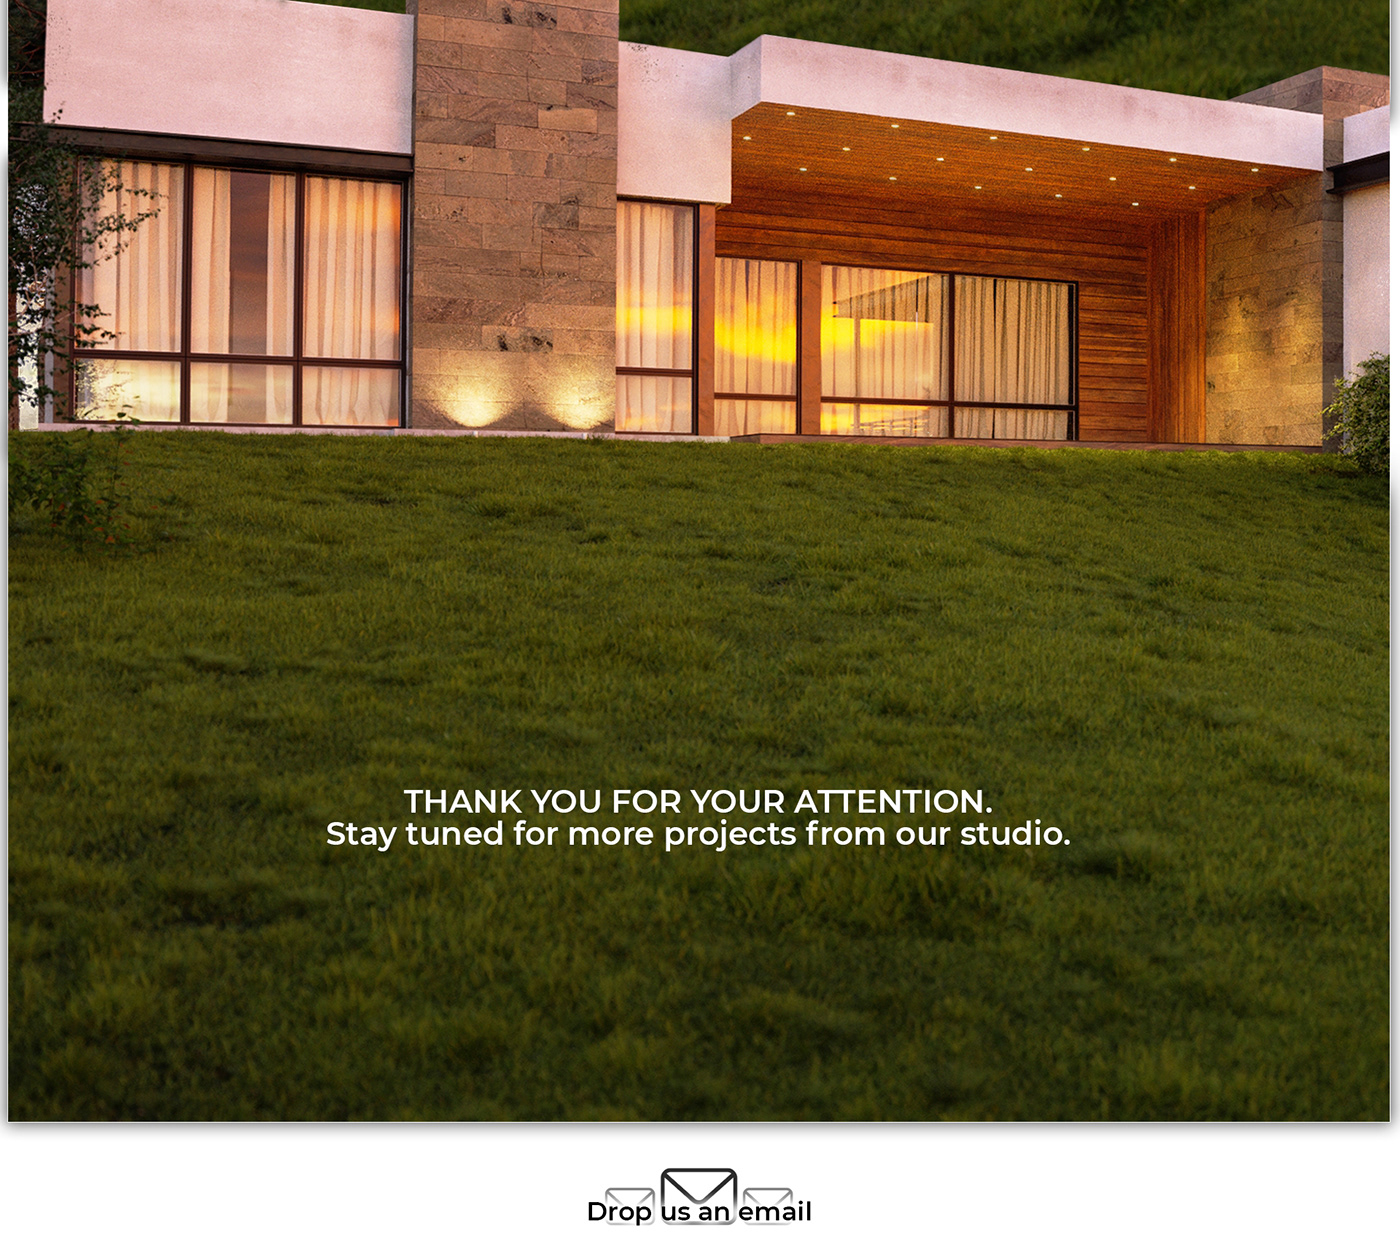 3d modeling 3D Rendering architecture CGI Landscape modeling rendering Residence visualization archviz